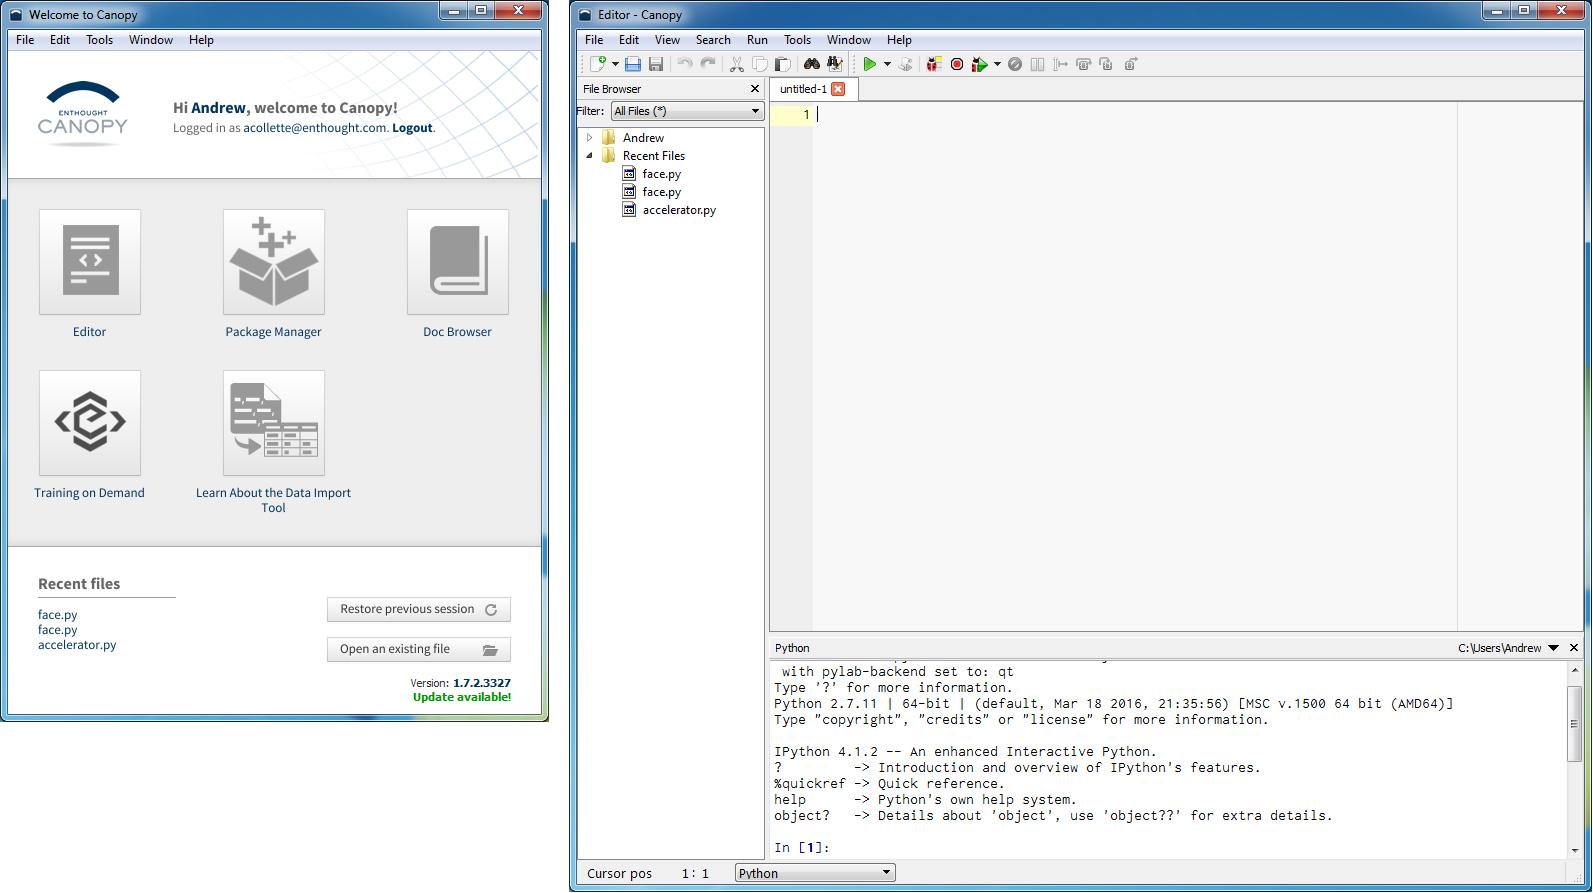 Getting Started — Python Integration Toolkit 1 2 0 documentation